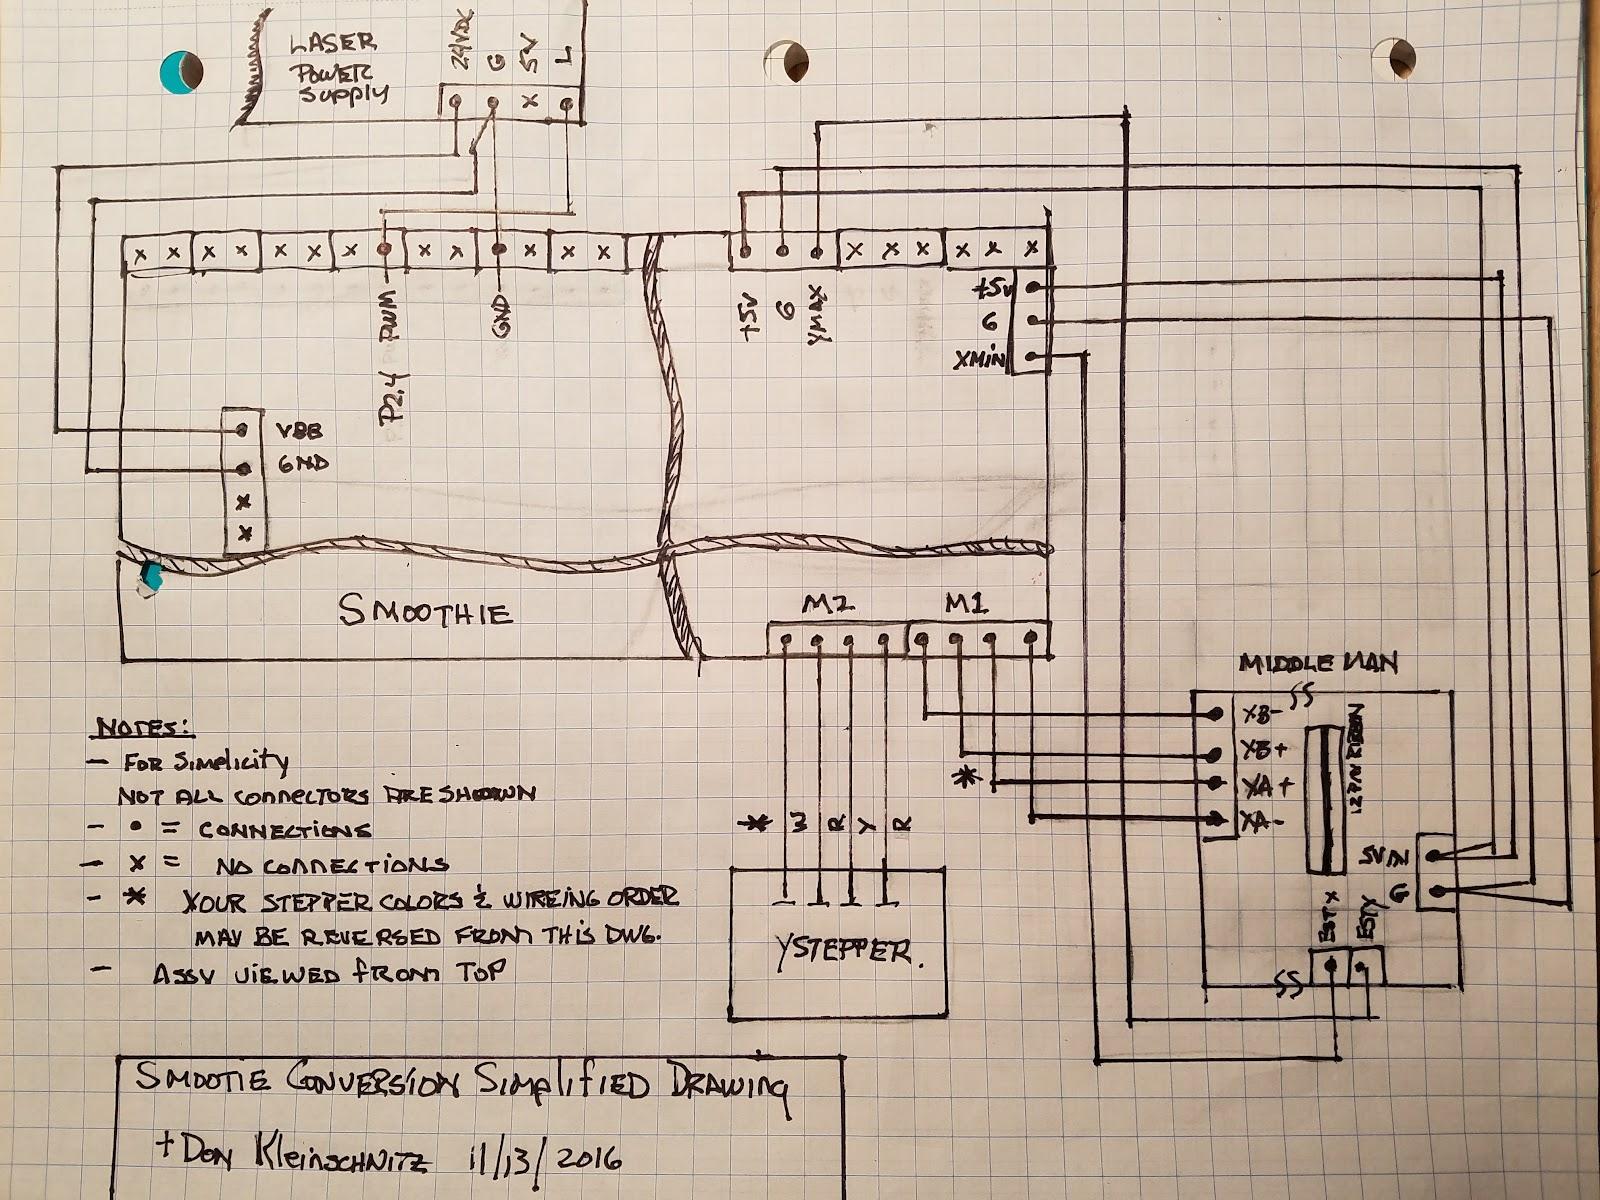 k40 fuse diagram wiring diagramk40 fuse diagram wiring diagram lapk40 fuse diagram wiring diagram database fuse [ 1600 x 1200 Pixel ]